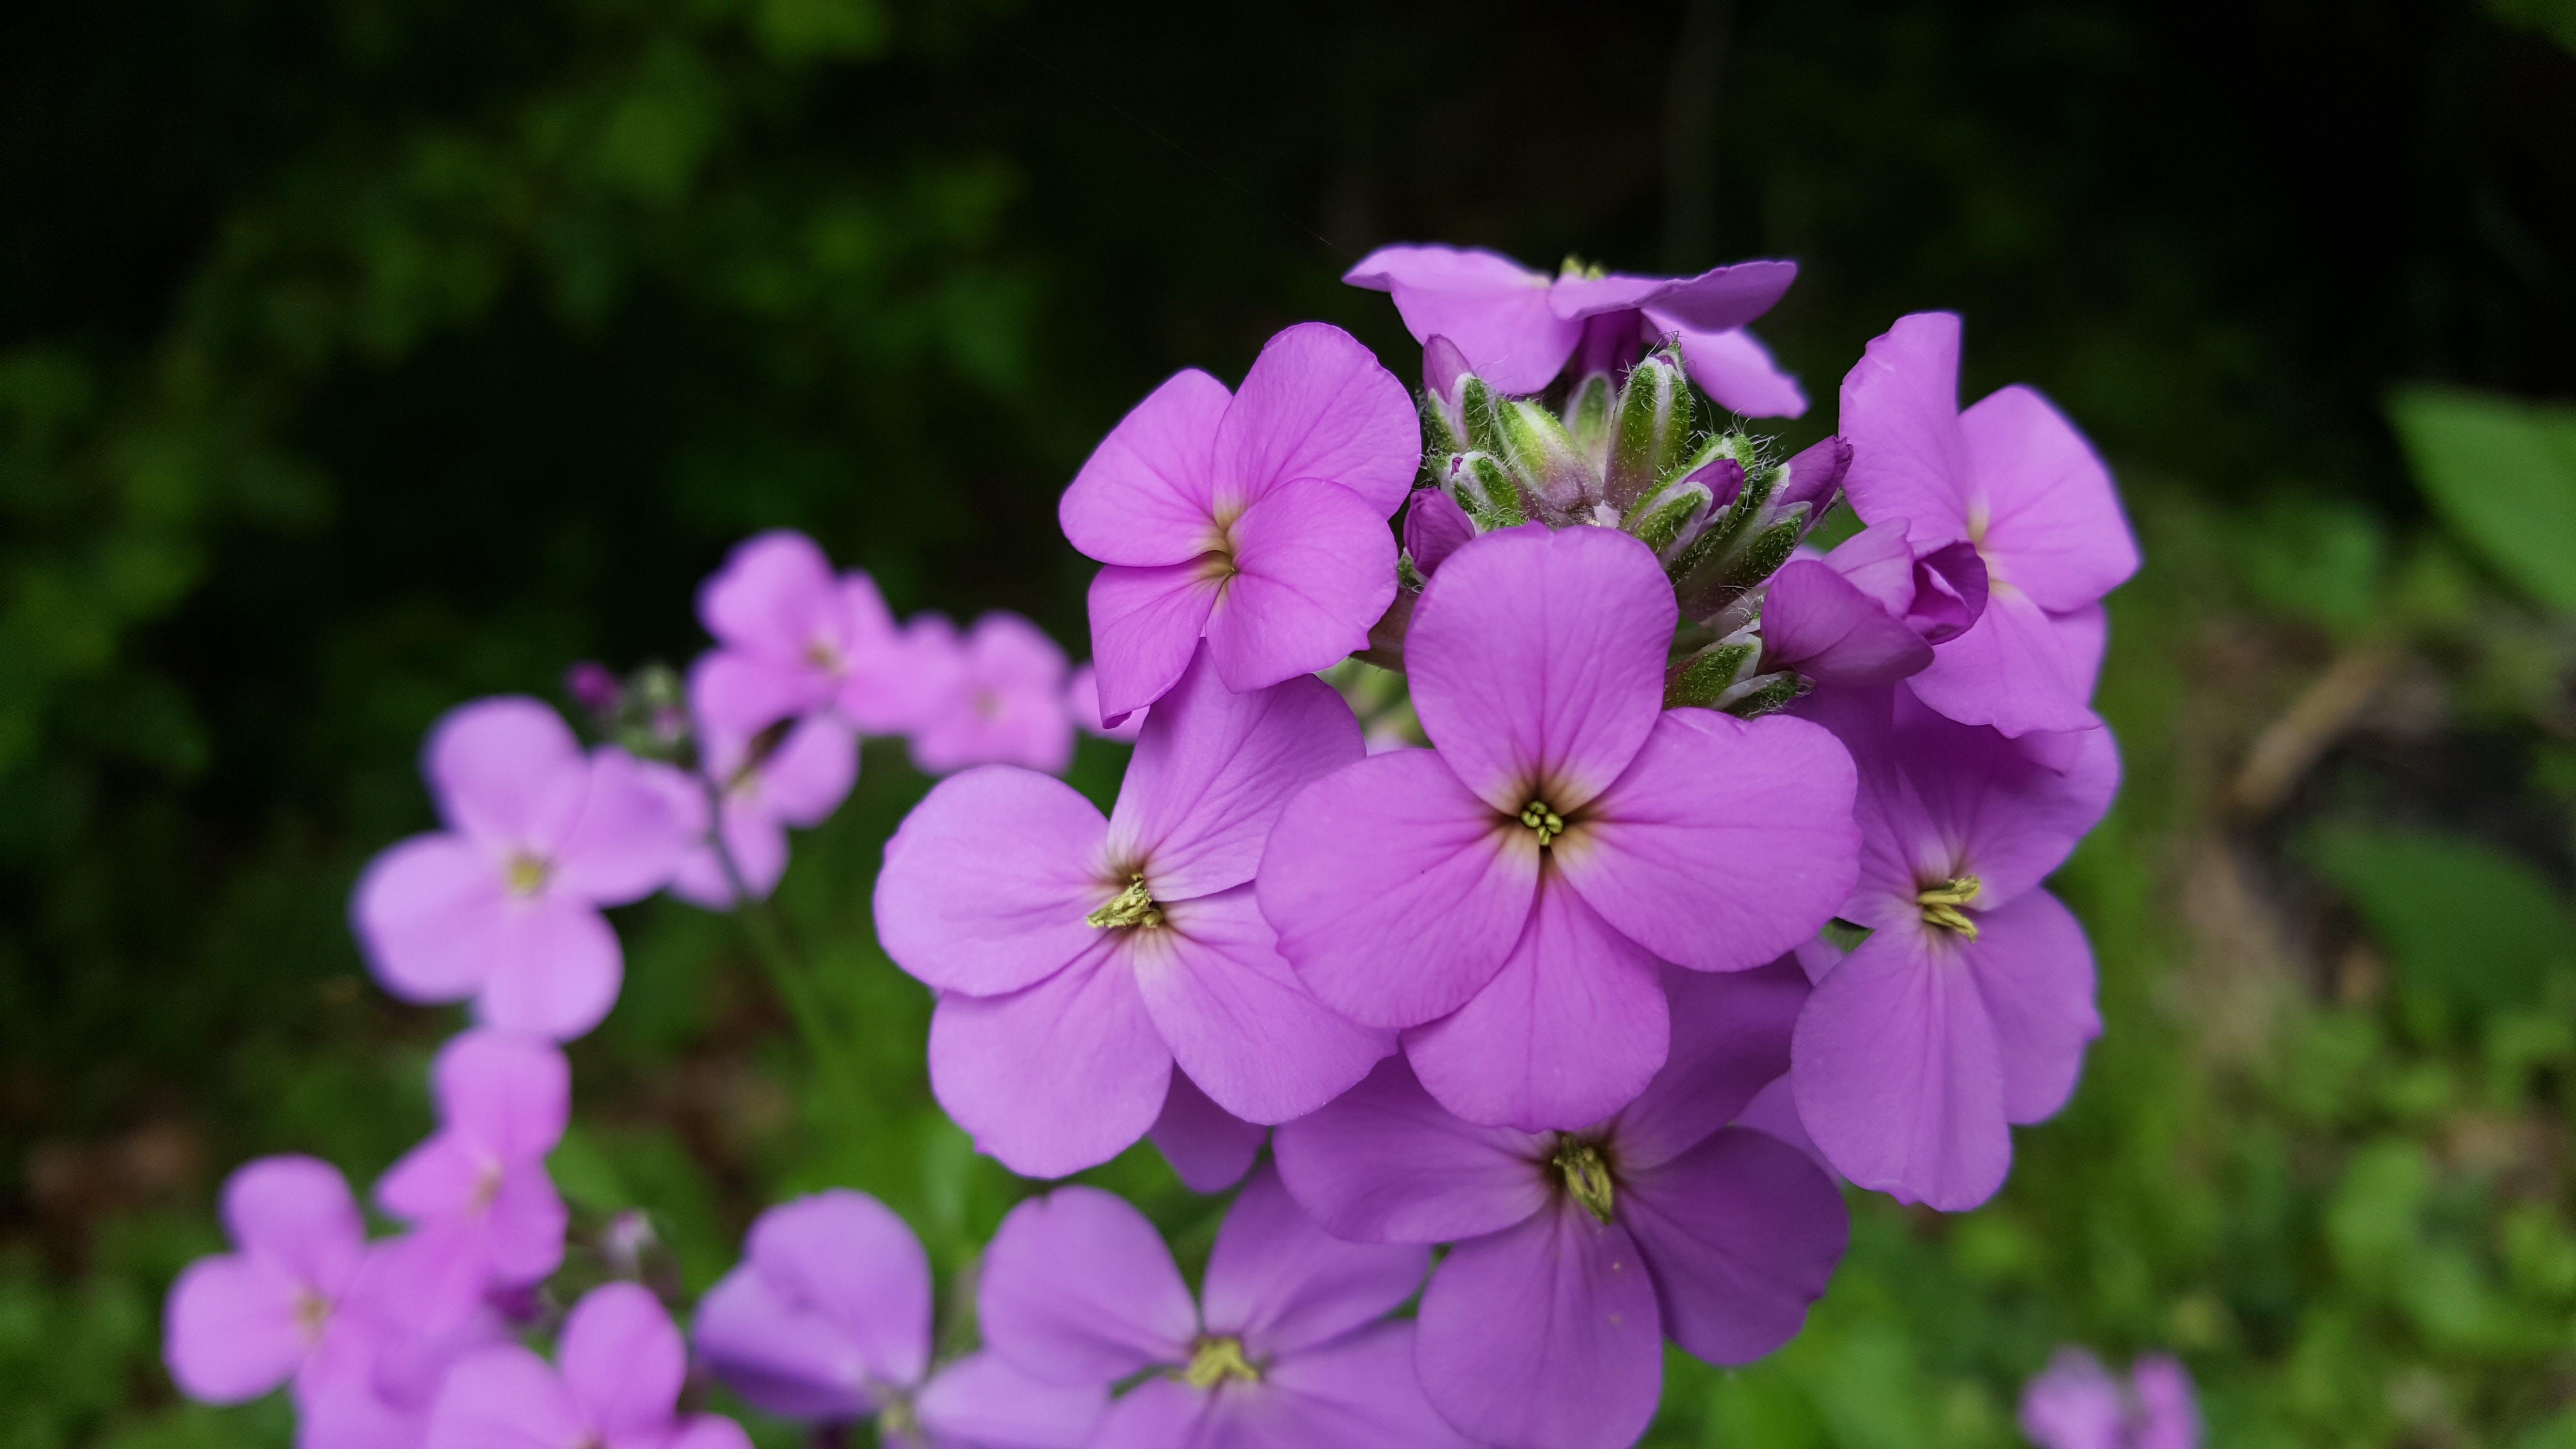 Free stock photo of beautiful flowers, spring